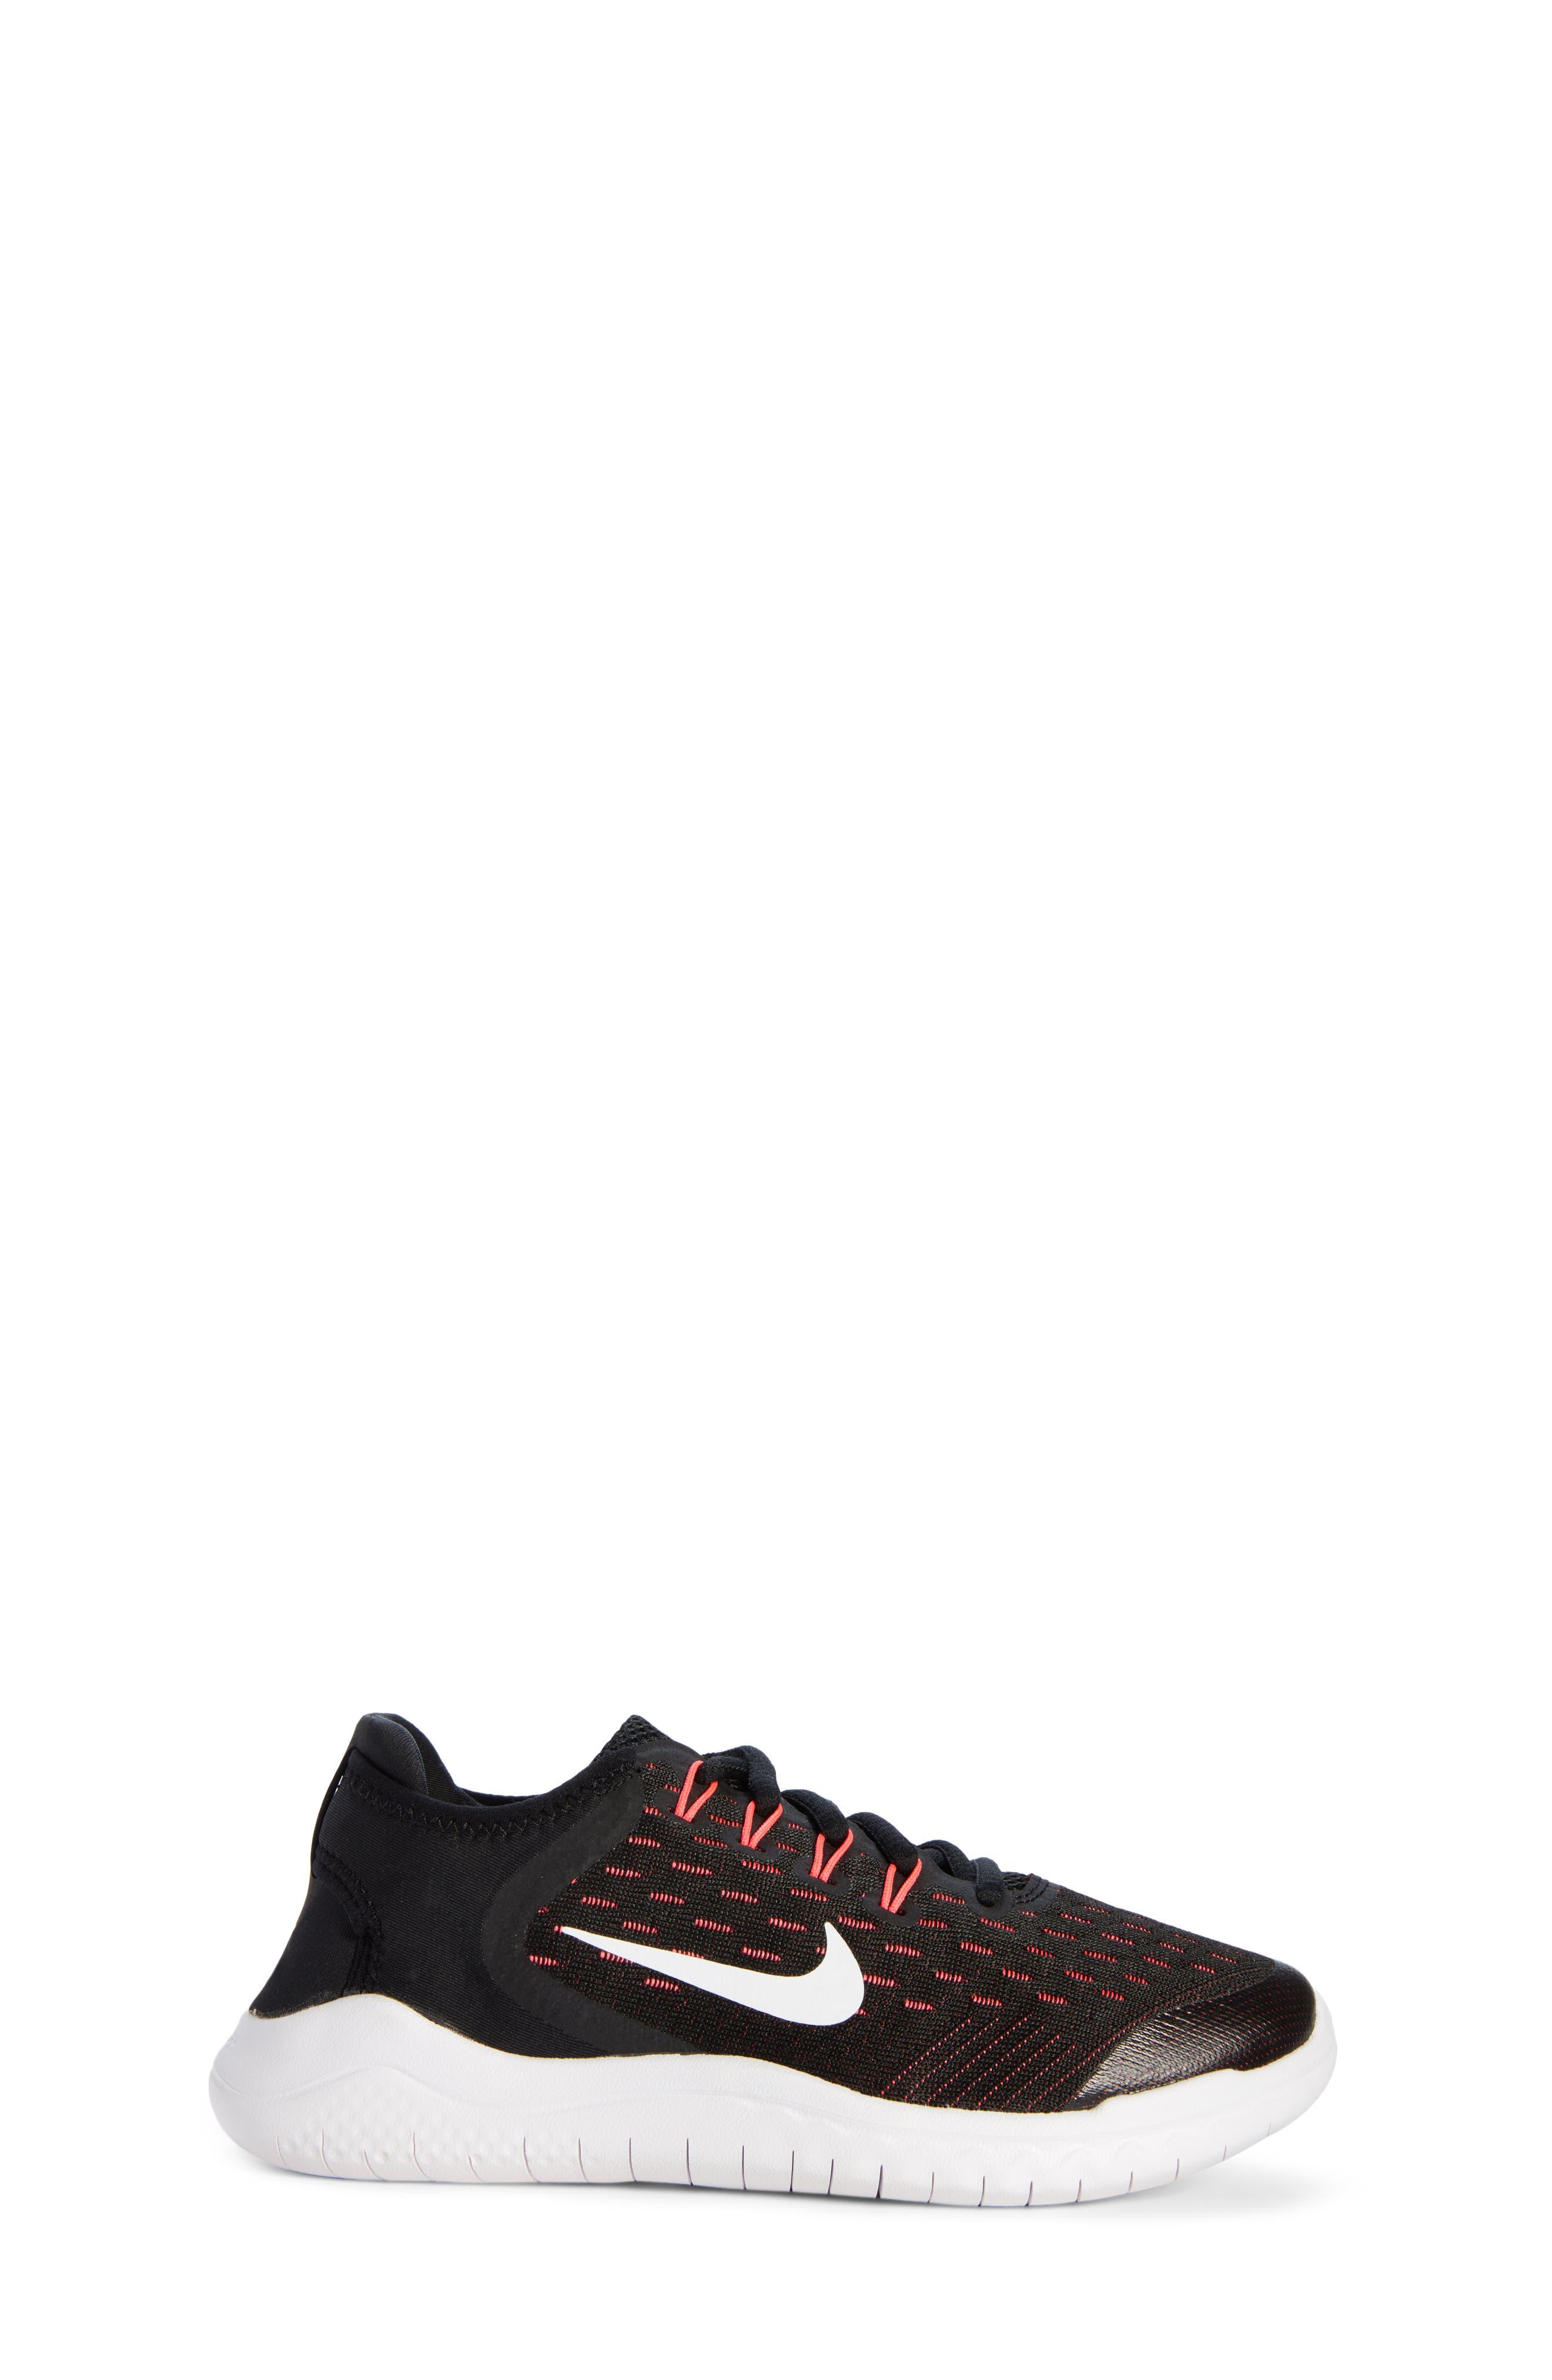 Free RN 2018 Running Shoe,                             Alternate thumbnail 3, color,                             Black/ White/ Pink/ Volt